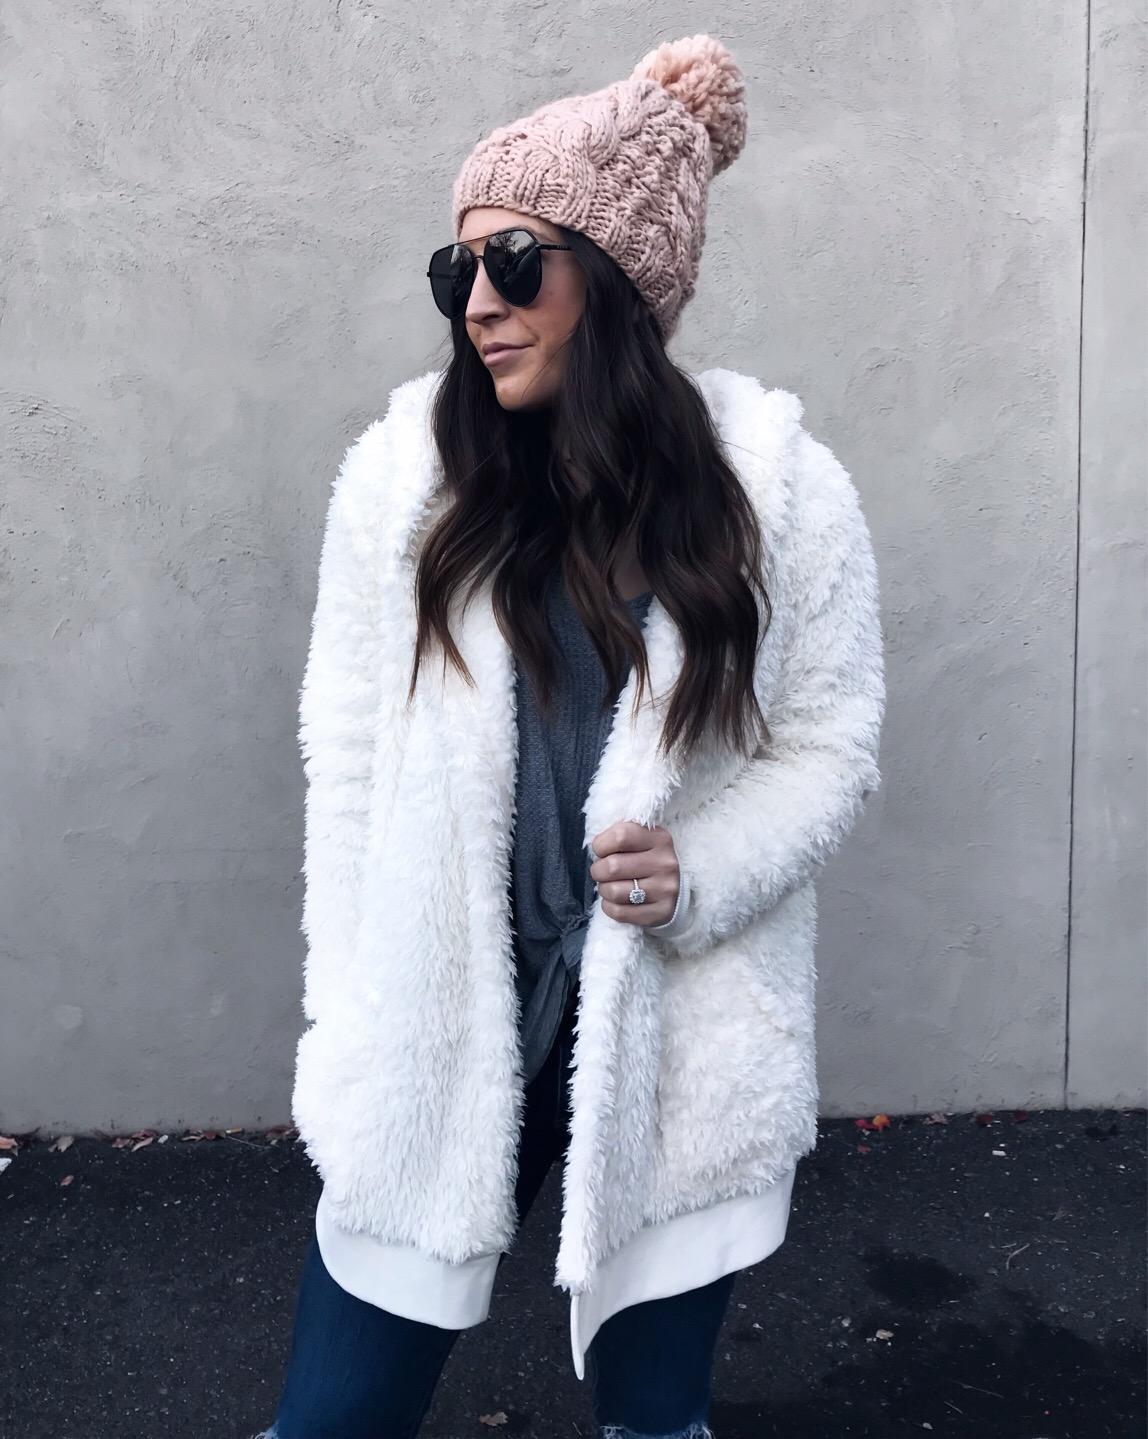 Weekend Sales & Instagram Round Up | Pine Barren Beauty | winter fashion, winter outfit idea, winter essentials, teddy coat, blush beanie, cozy outfit idea